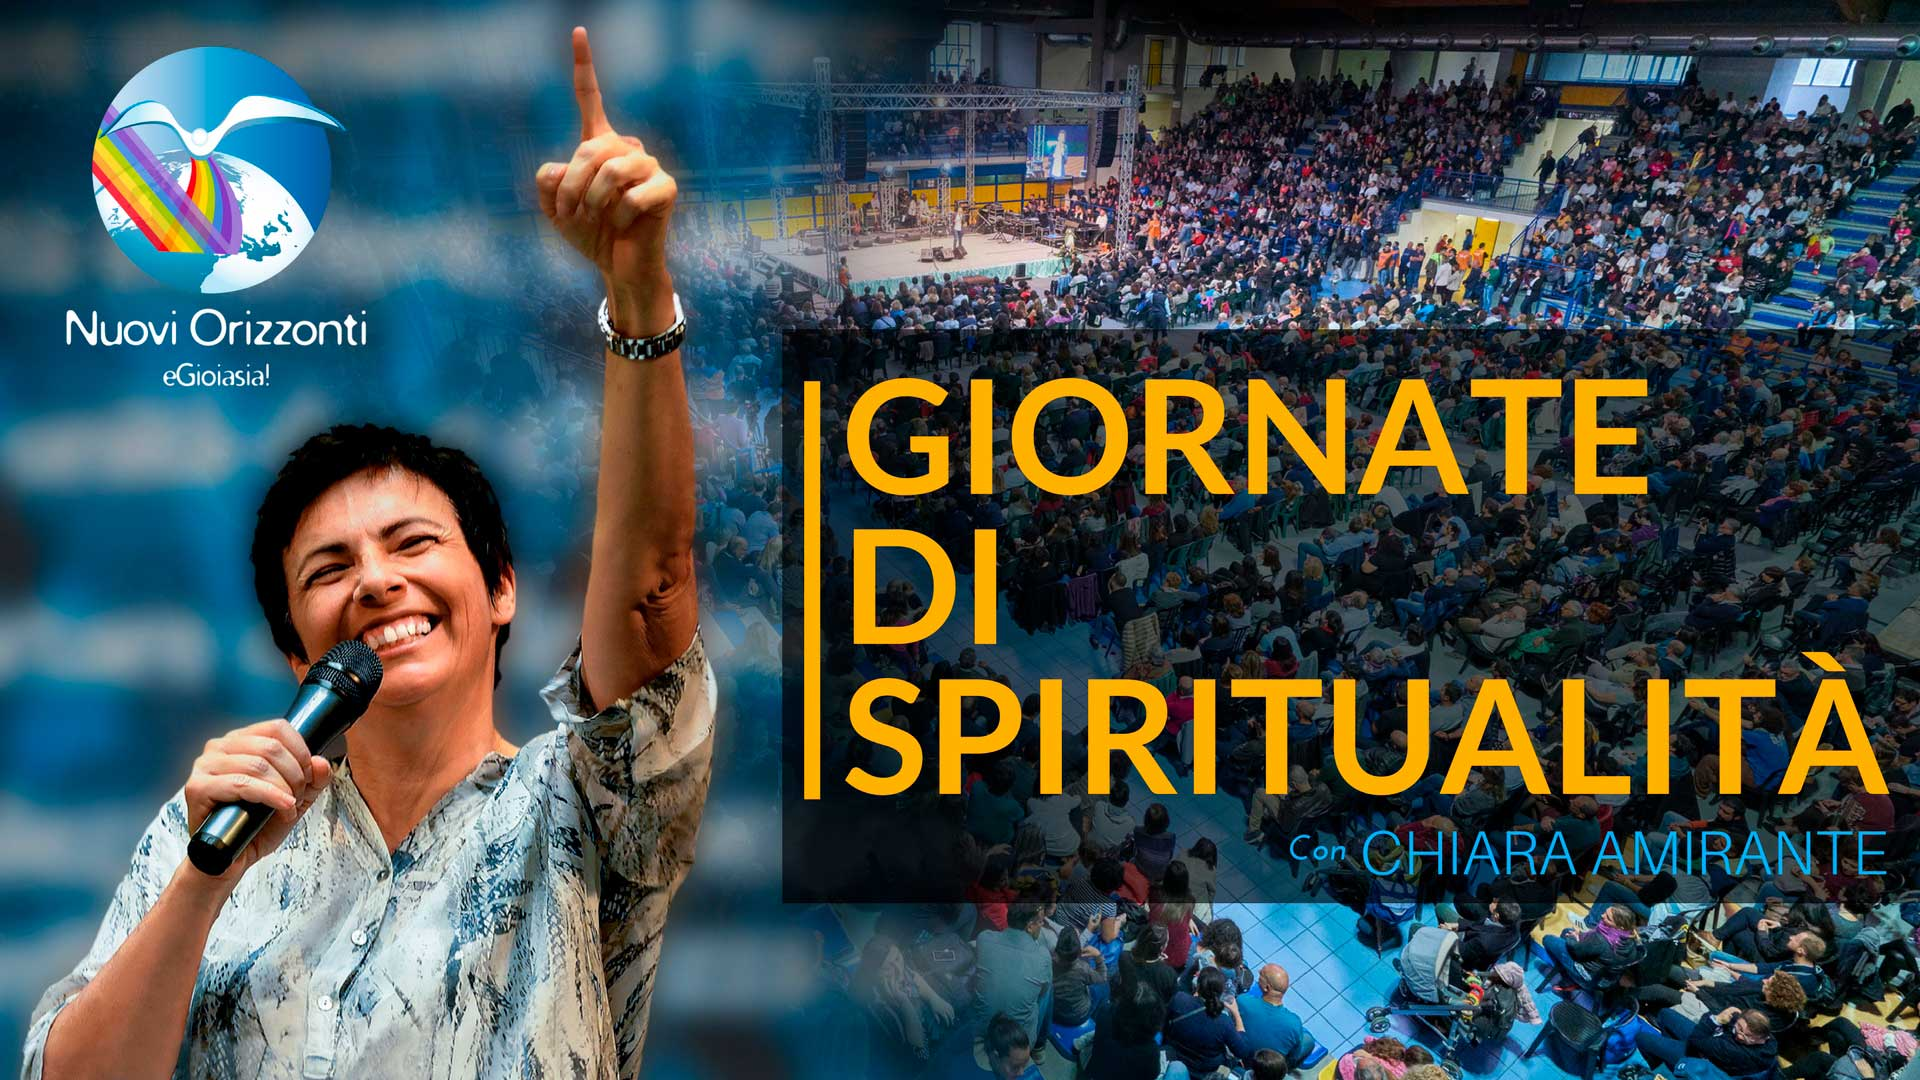 Giornate di Spiritualità 2018-2019 - Nuovi Orizzonti